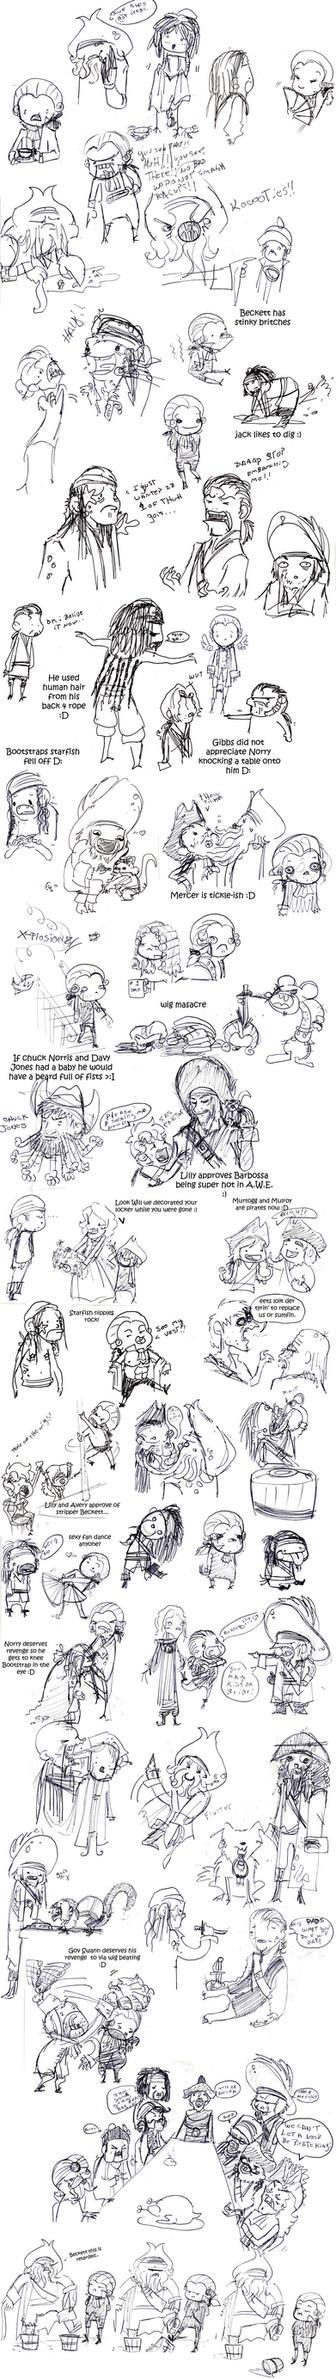 POTC: AWE sketch dump 3 by OhSadface